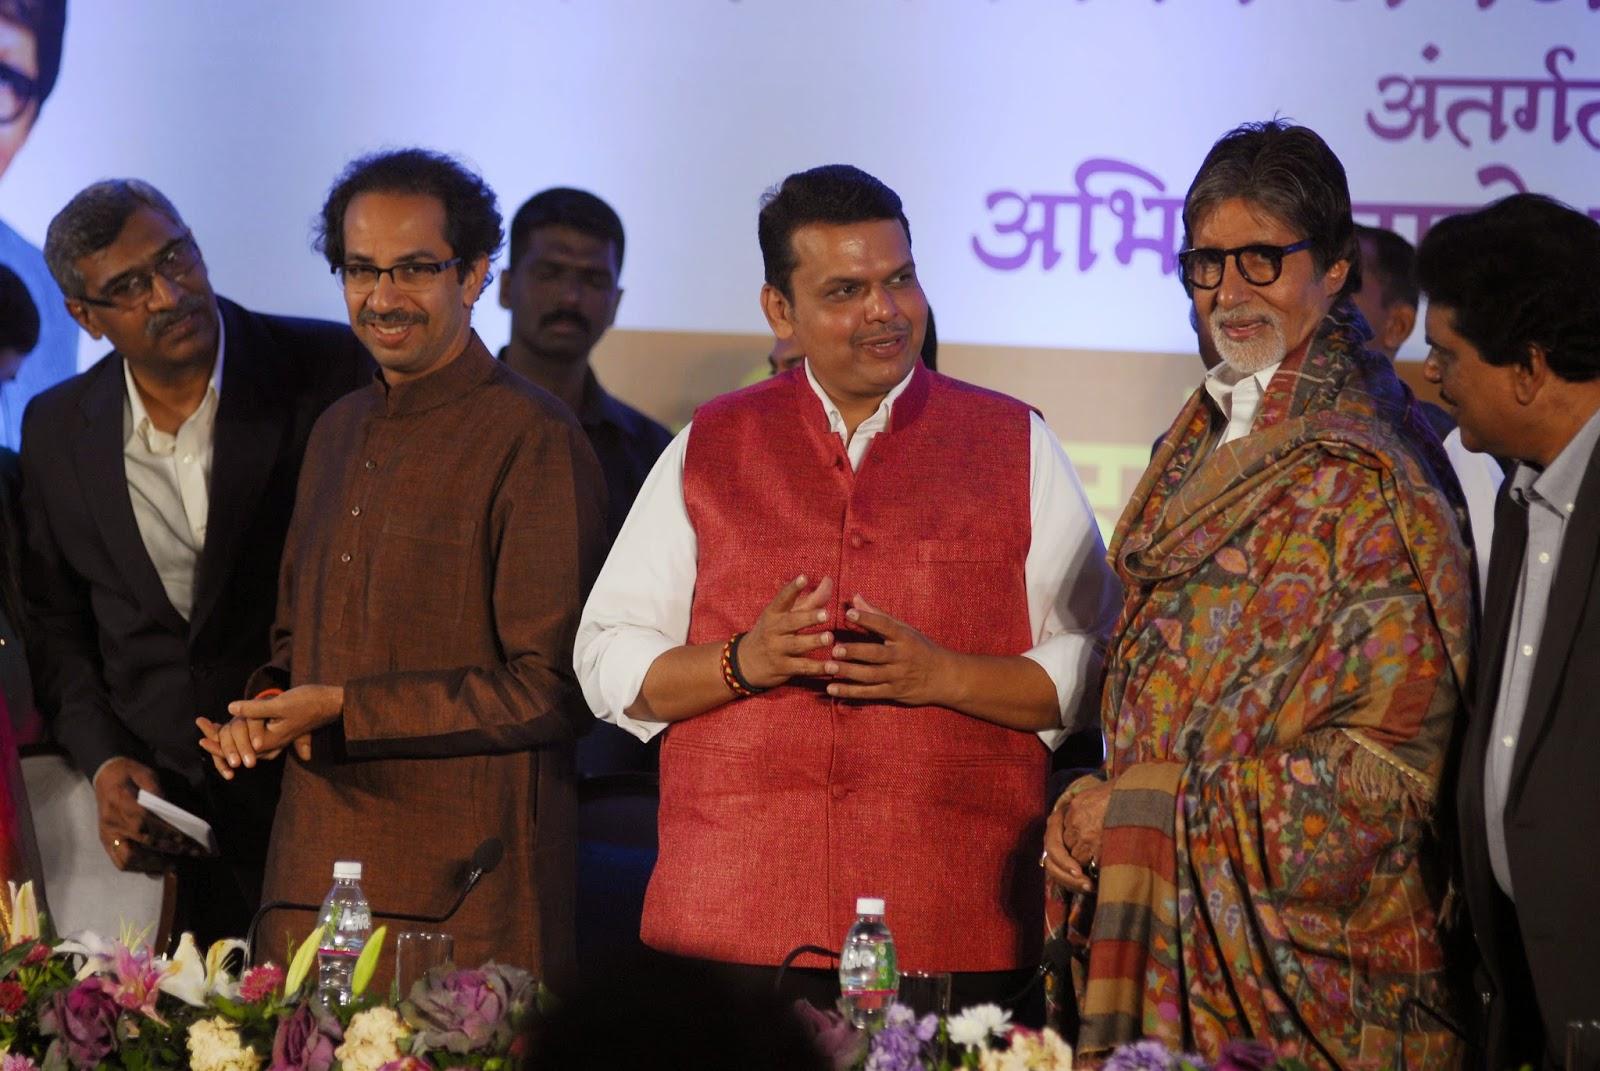 Amitabh Bachchan launches 'TB Harega Desh Jeetega' campaign at Maharashtra